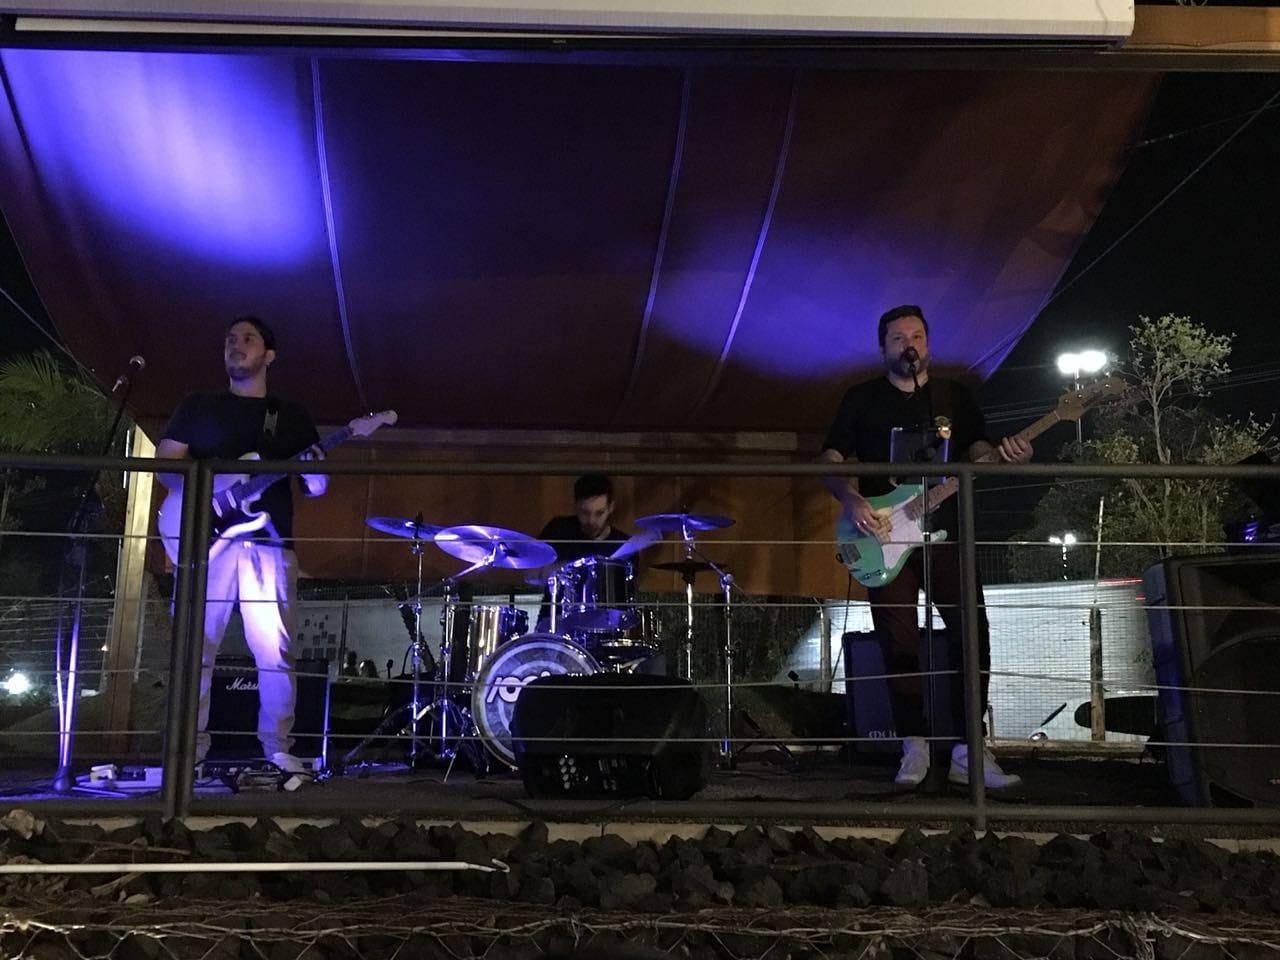 Banda Go Back se apresenta a partir das 20h no Let's Grill. Crédito: Renata Tavares